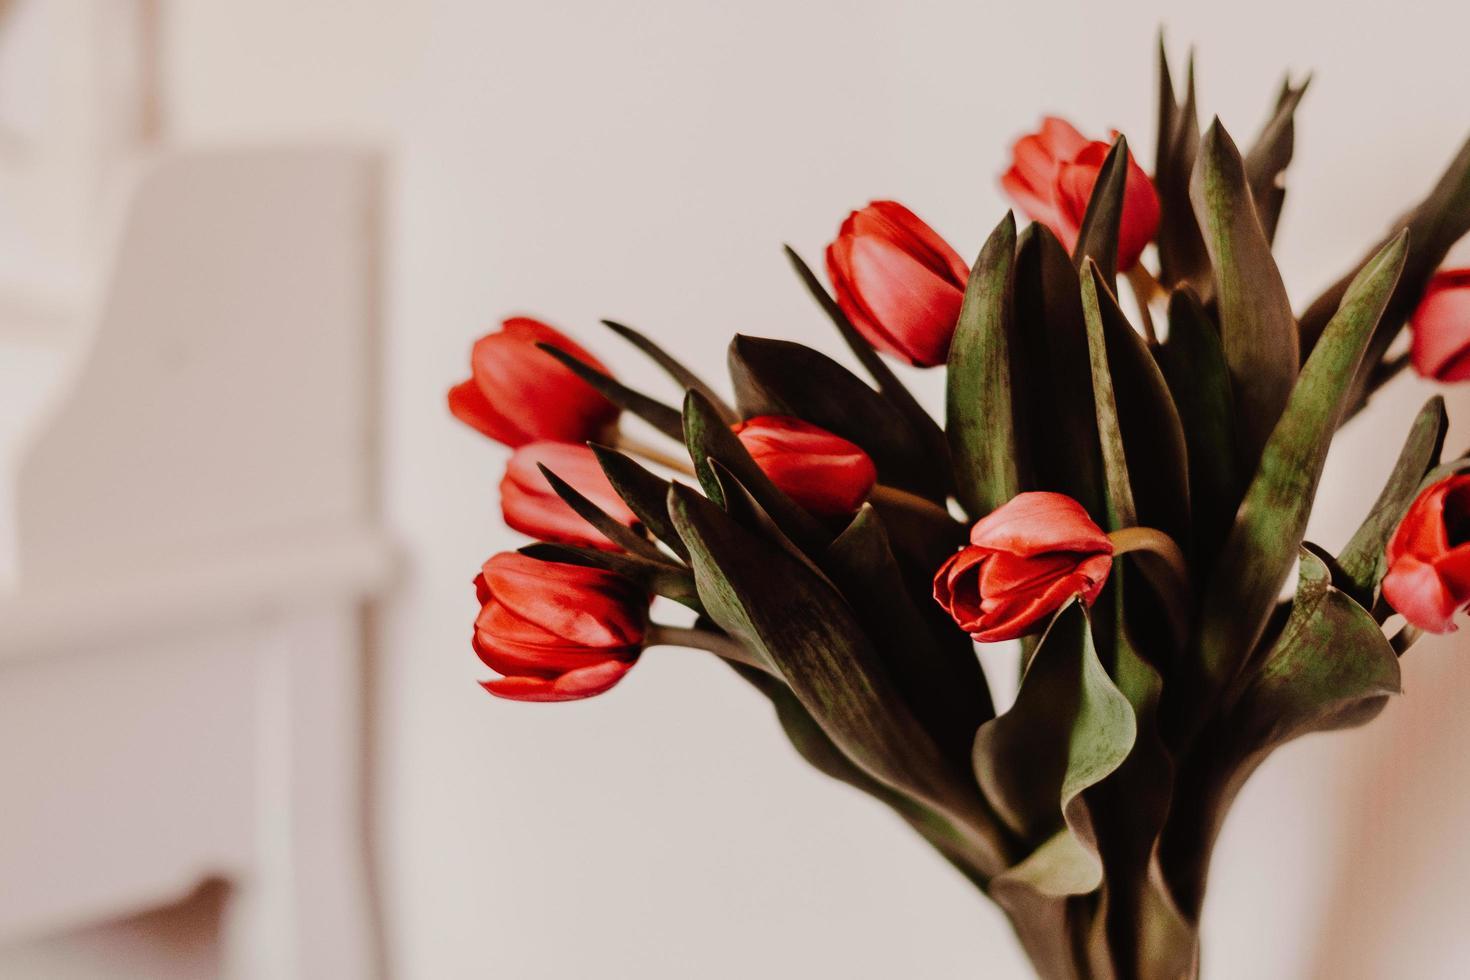 Red tulips in vase photo